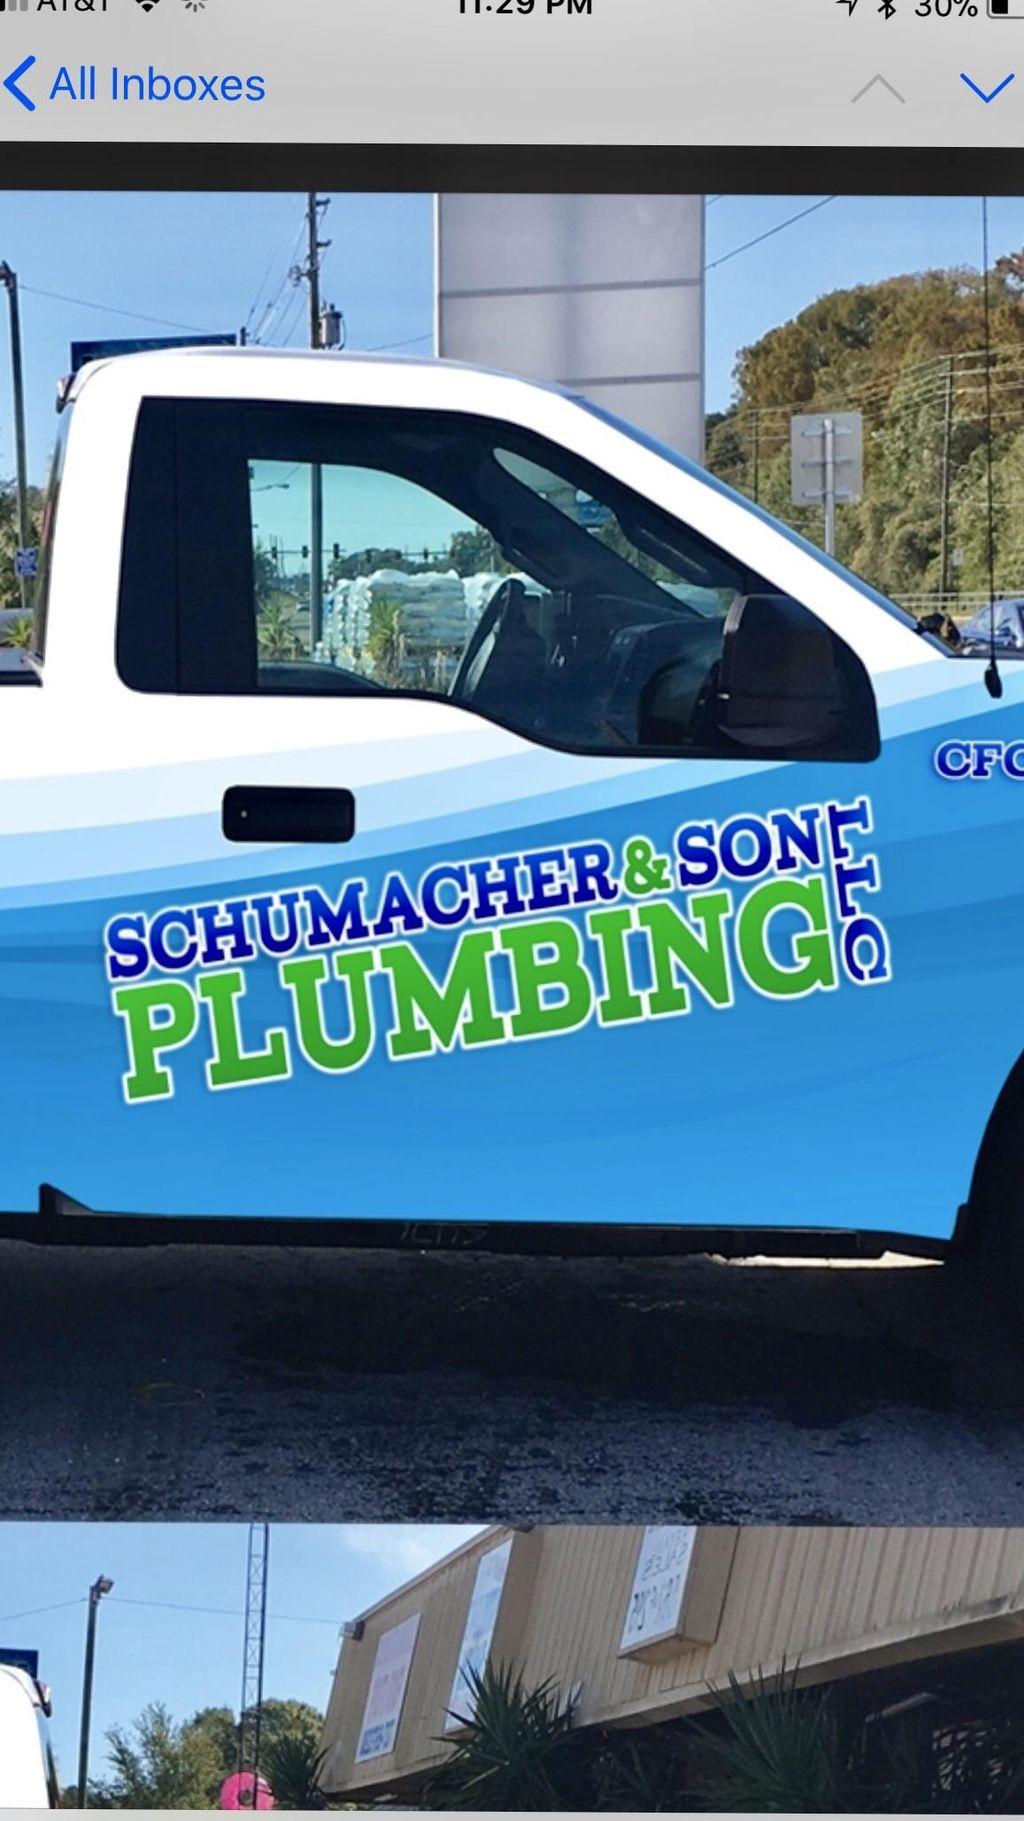 Schumacher&son Plumbing